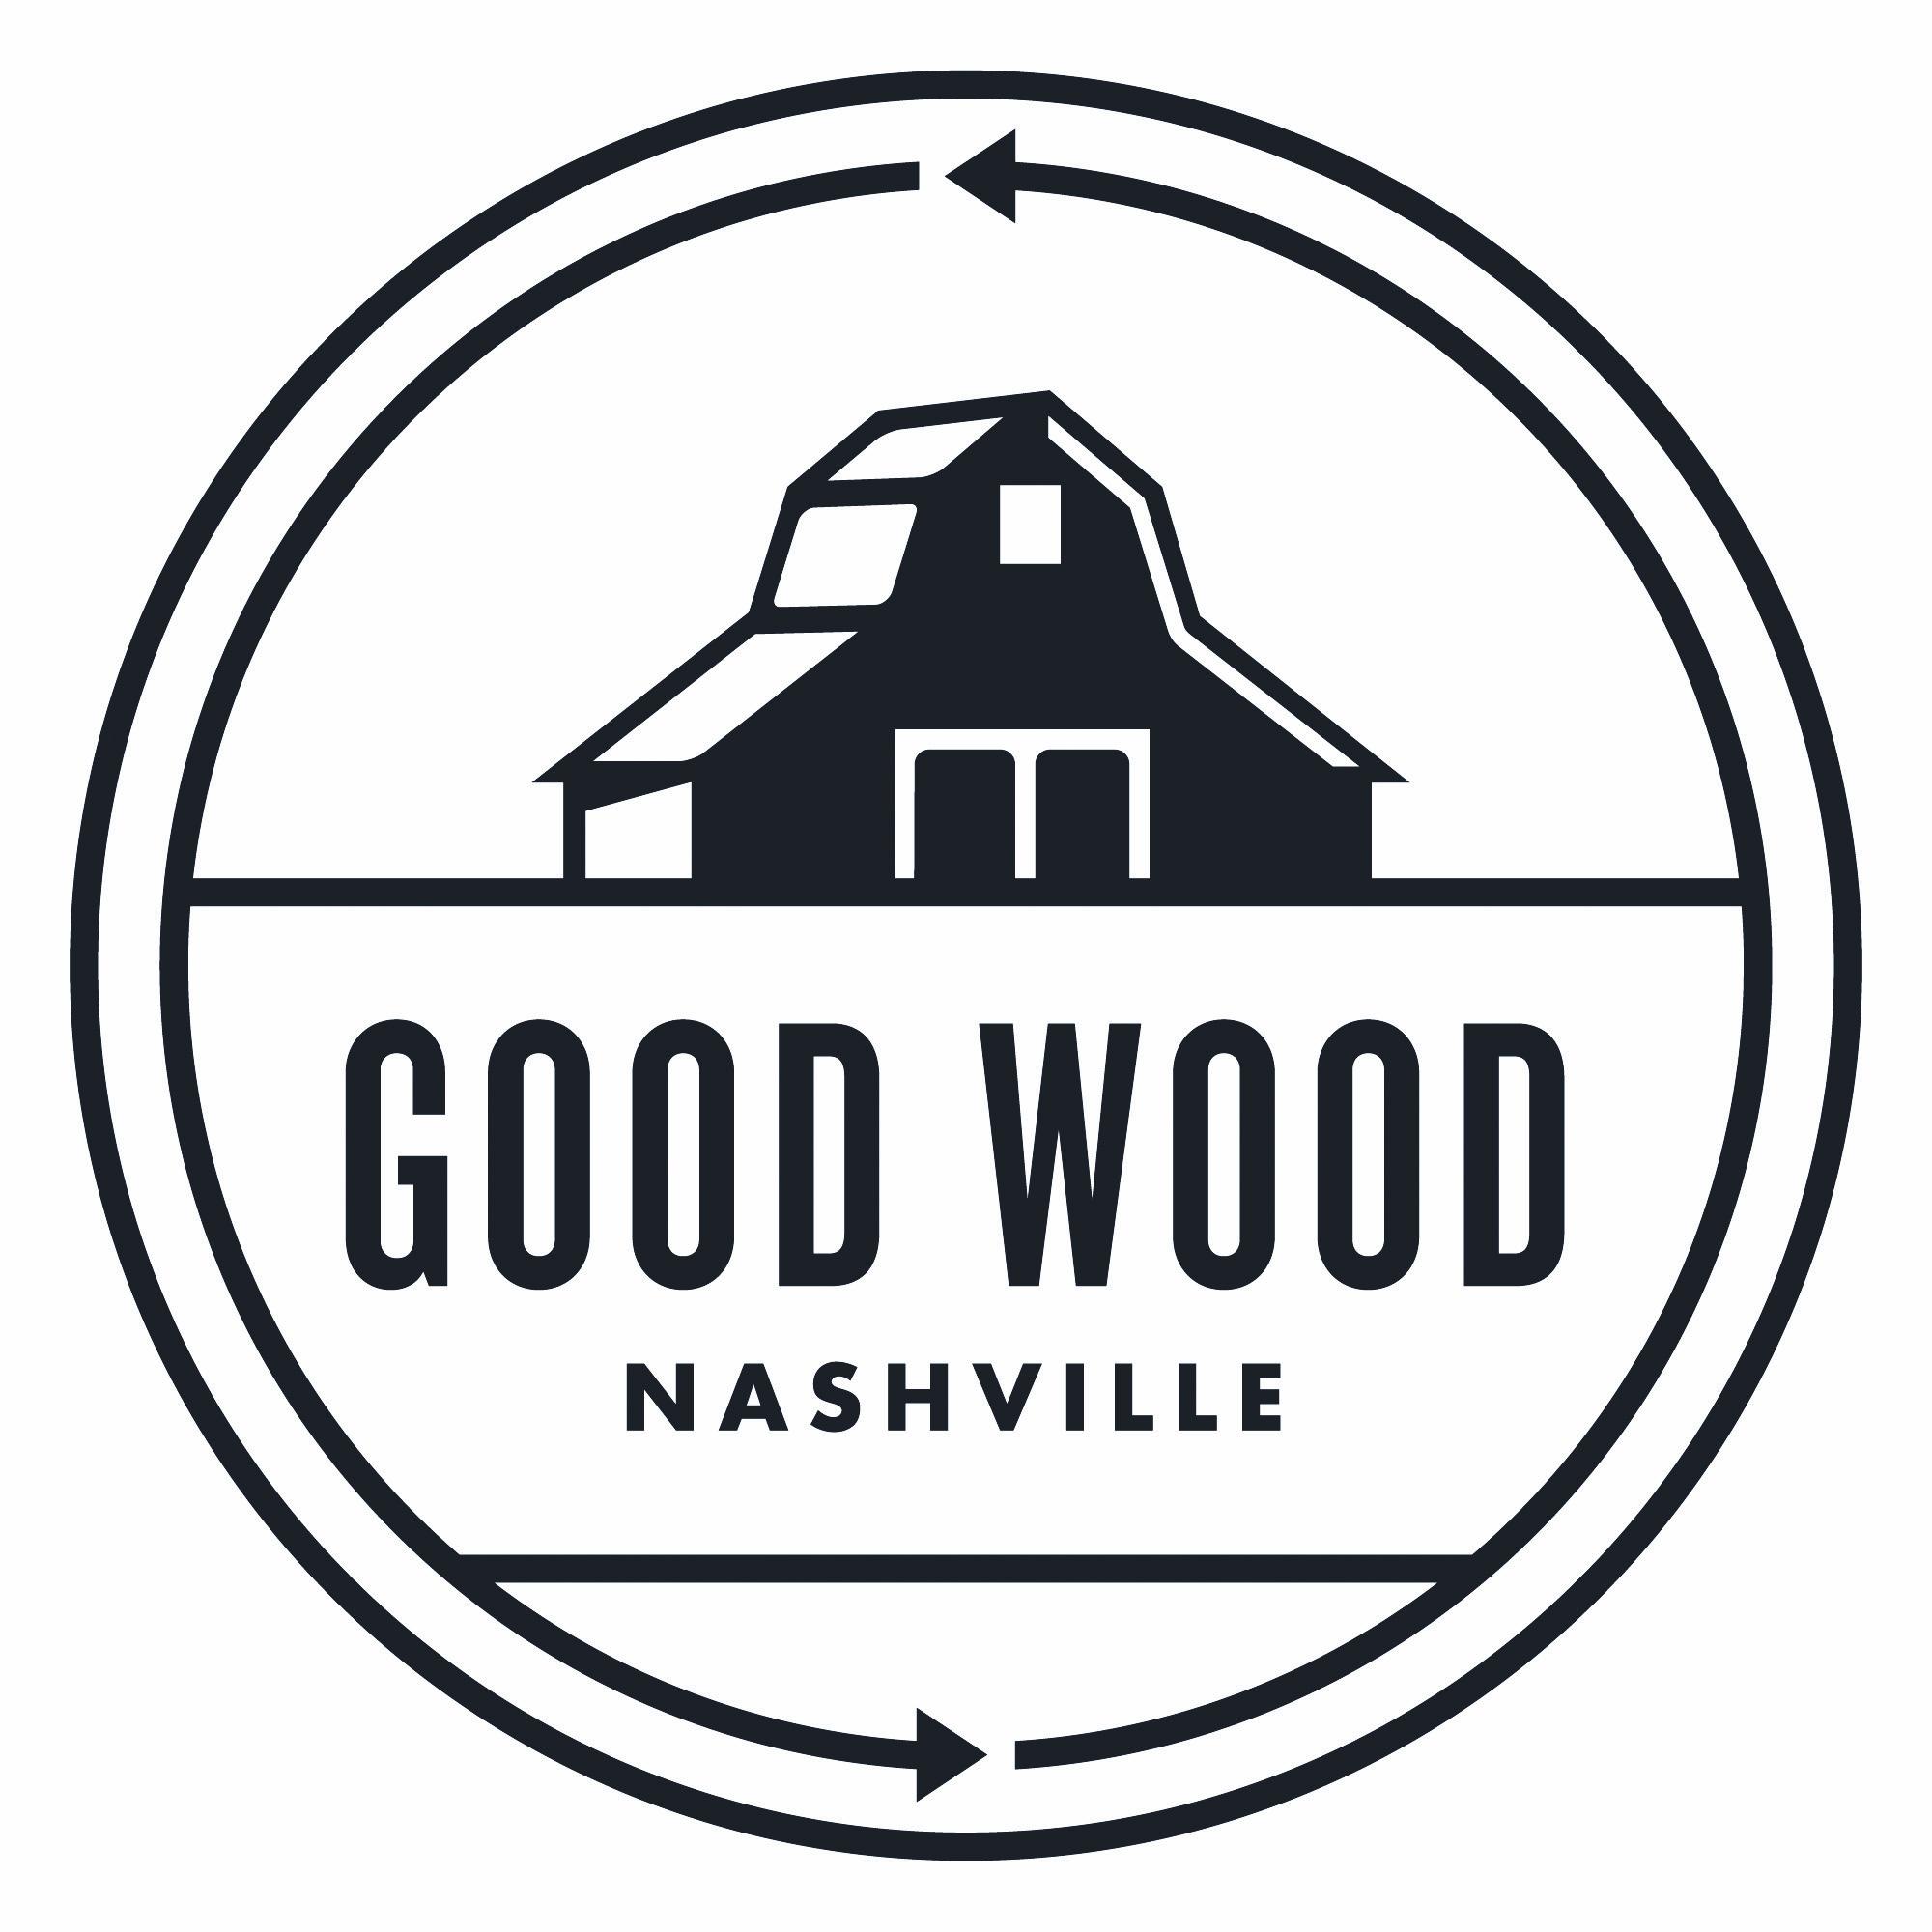 Good Wood Nashville